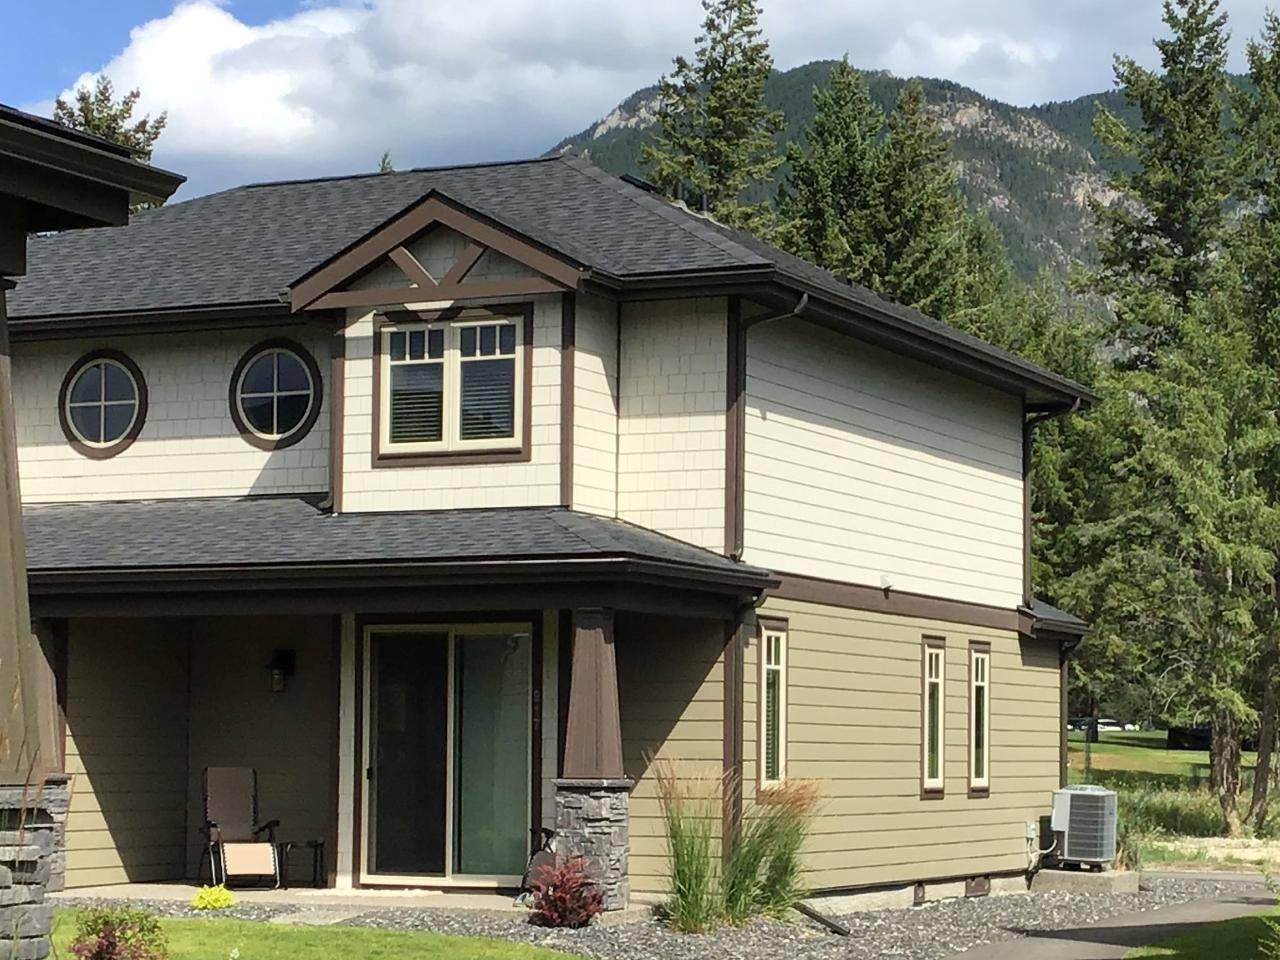 Townhouse for sale at 900 Bighorn Boulevard  Unit 917 Radium Hot Springs British Columbia - MLS: 2451717